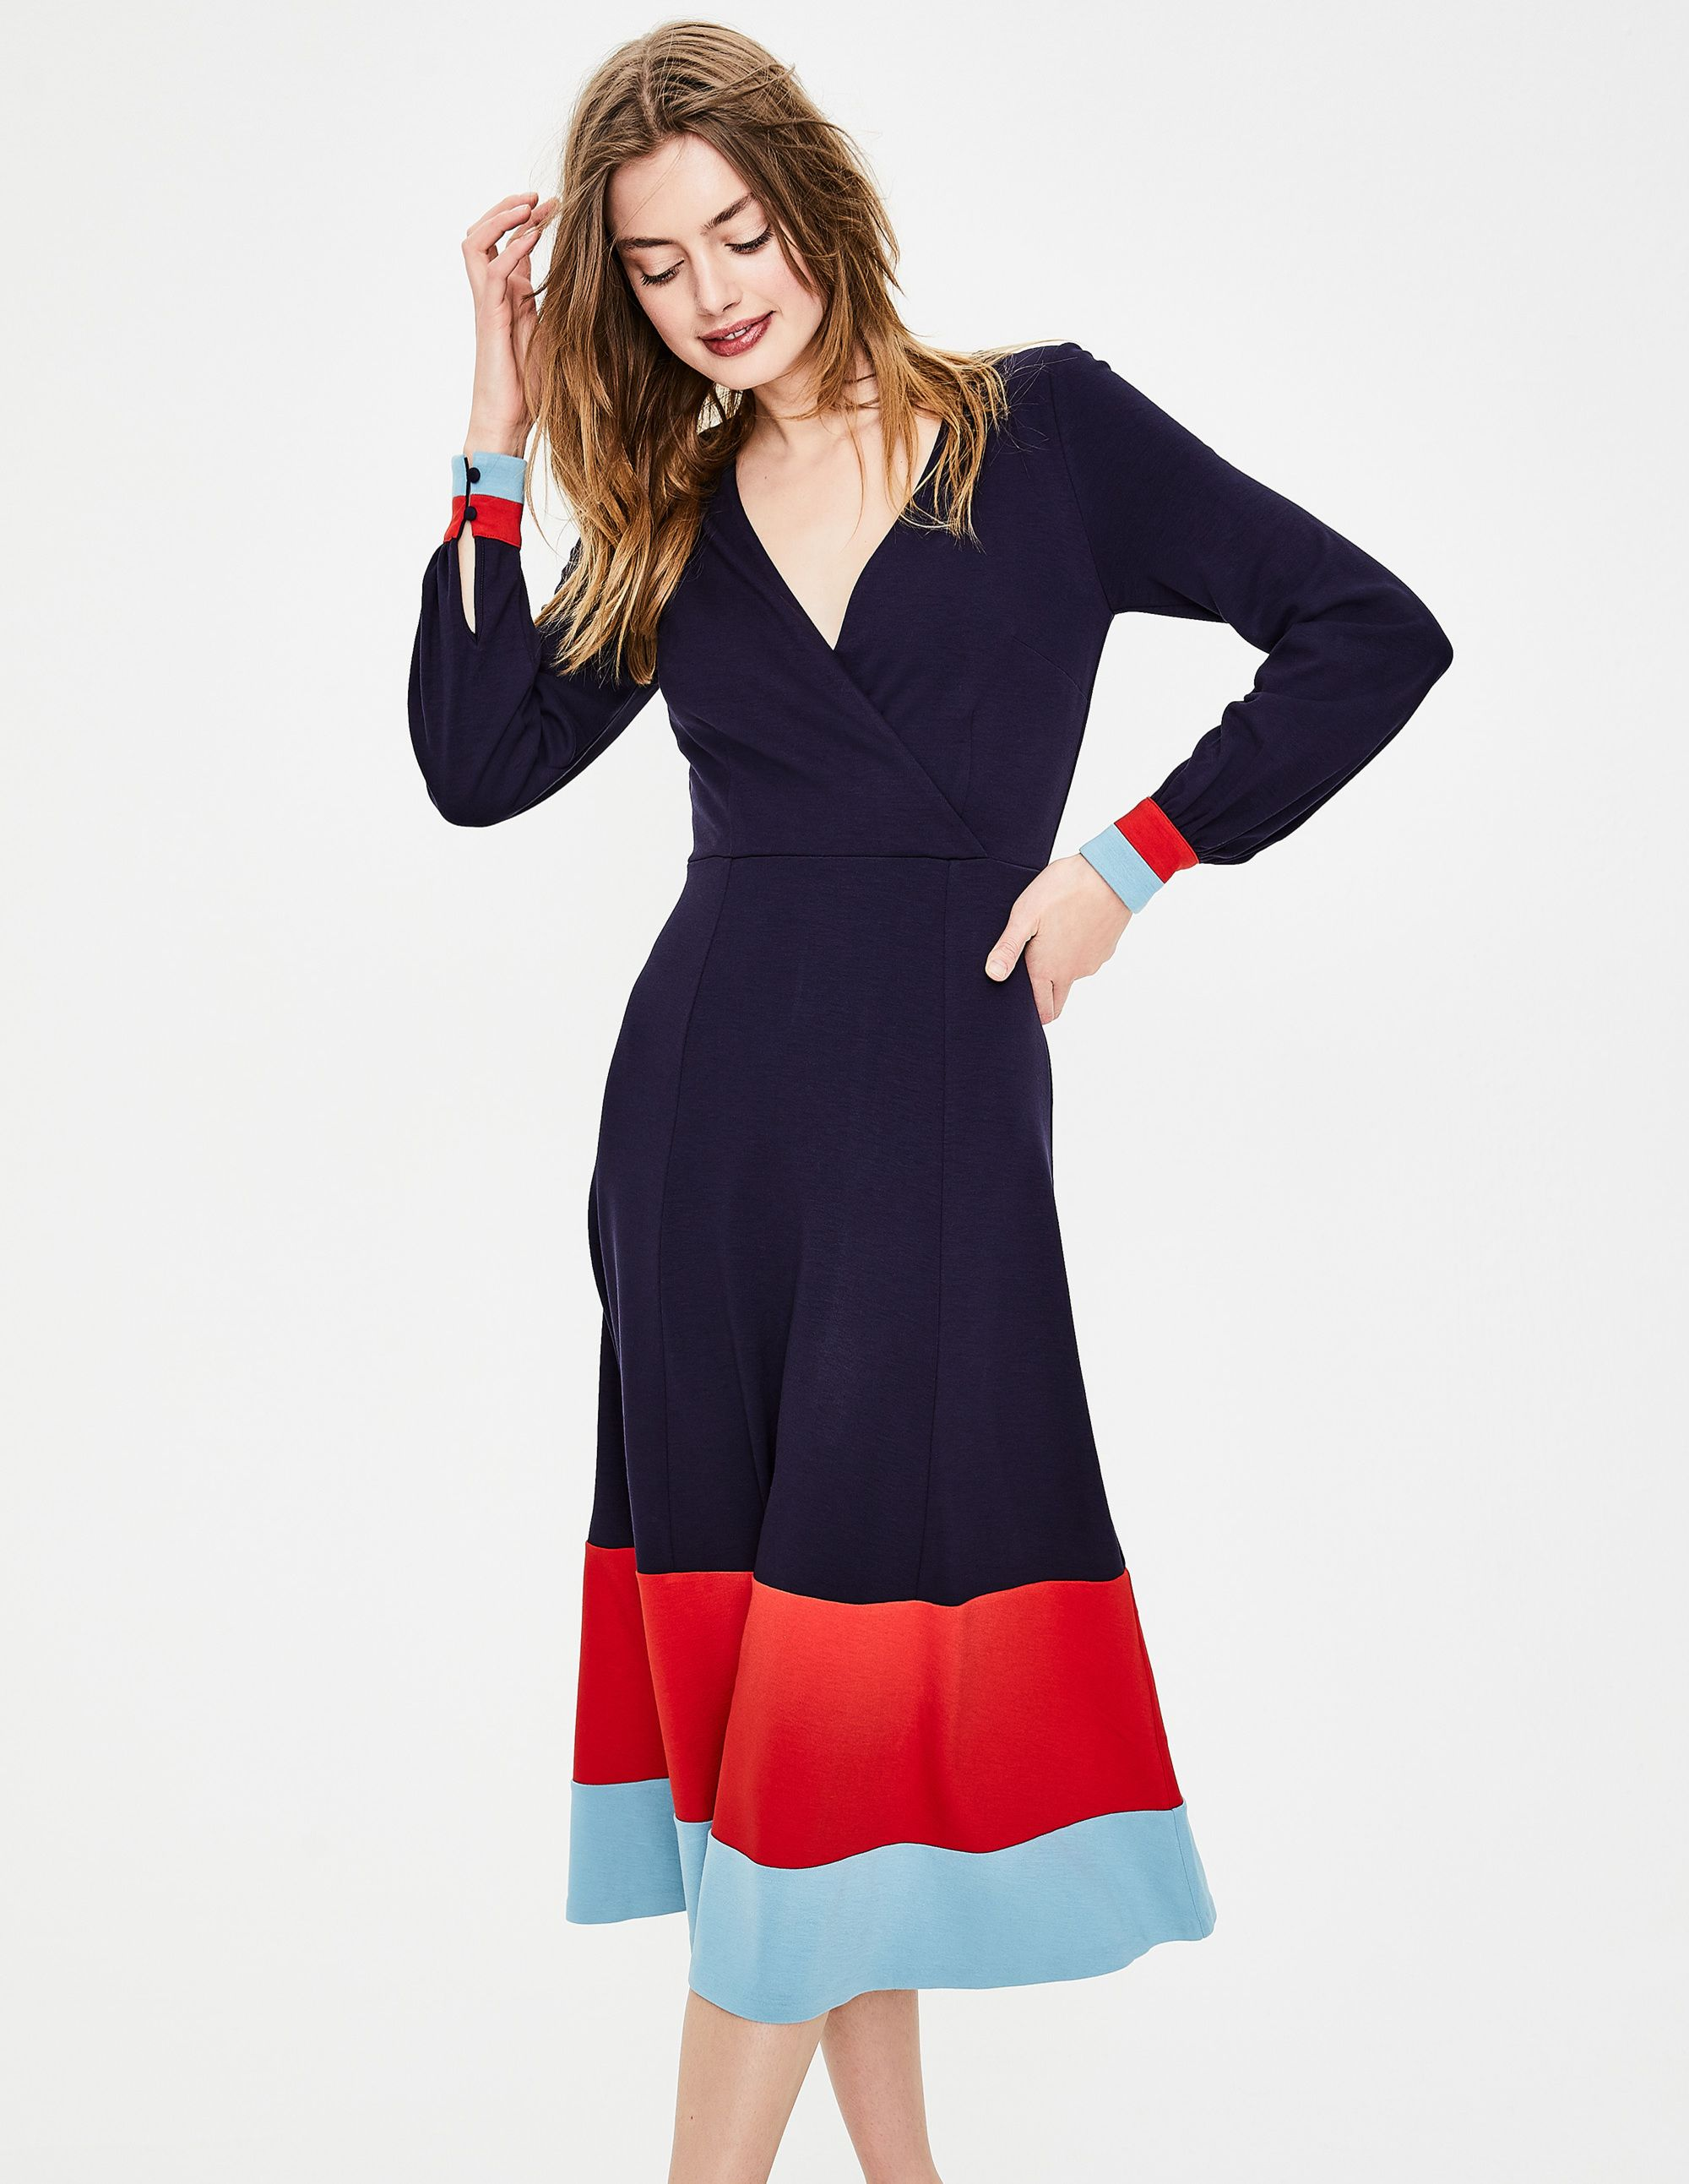 Magnolia Jersey Midi Dress J0228 Occasionwear At Boden Smart Day Dresses Navy Midi Dress Latest Fashion Dresses [ 2586 x 2000 Pixel ]